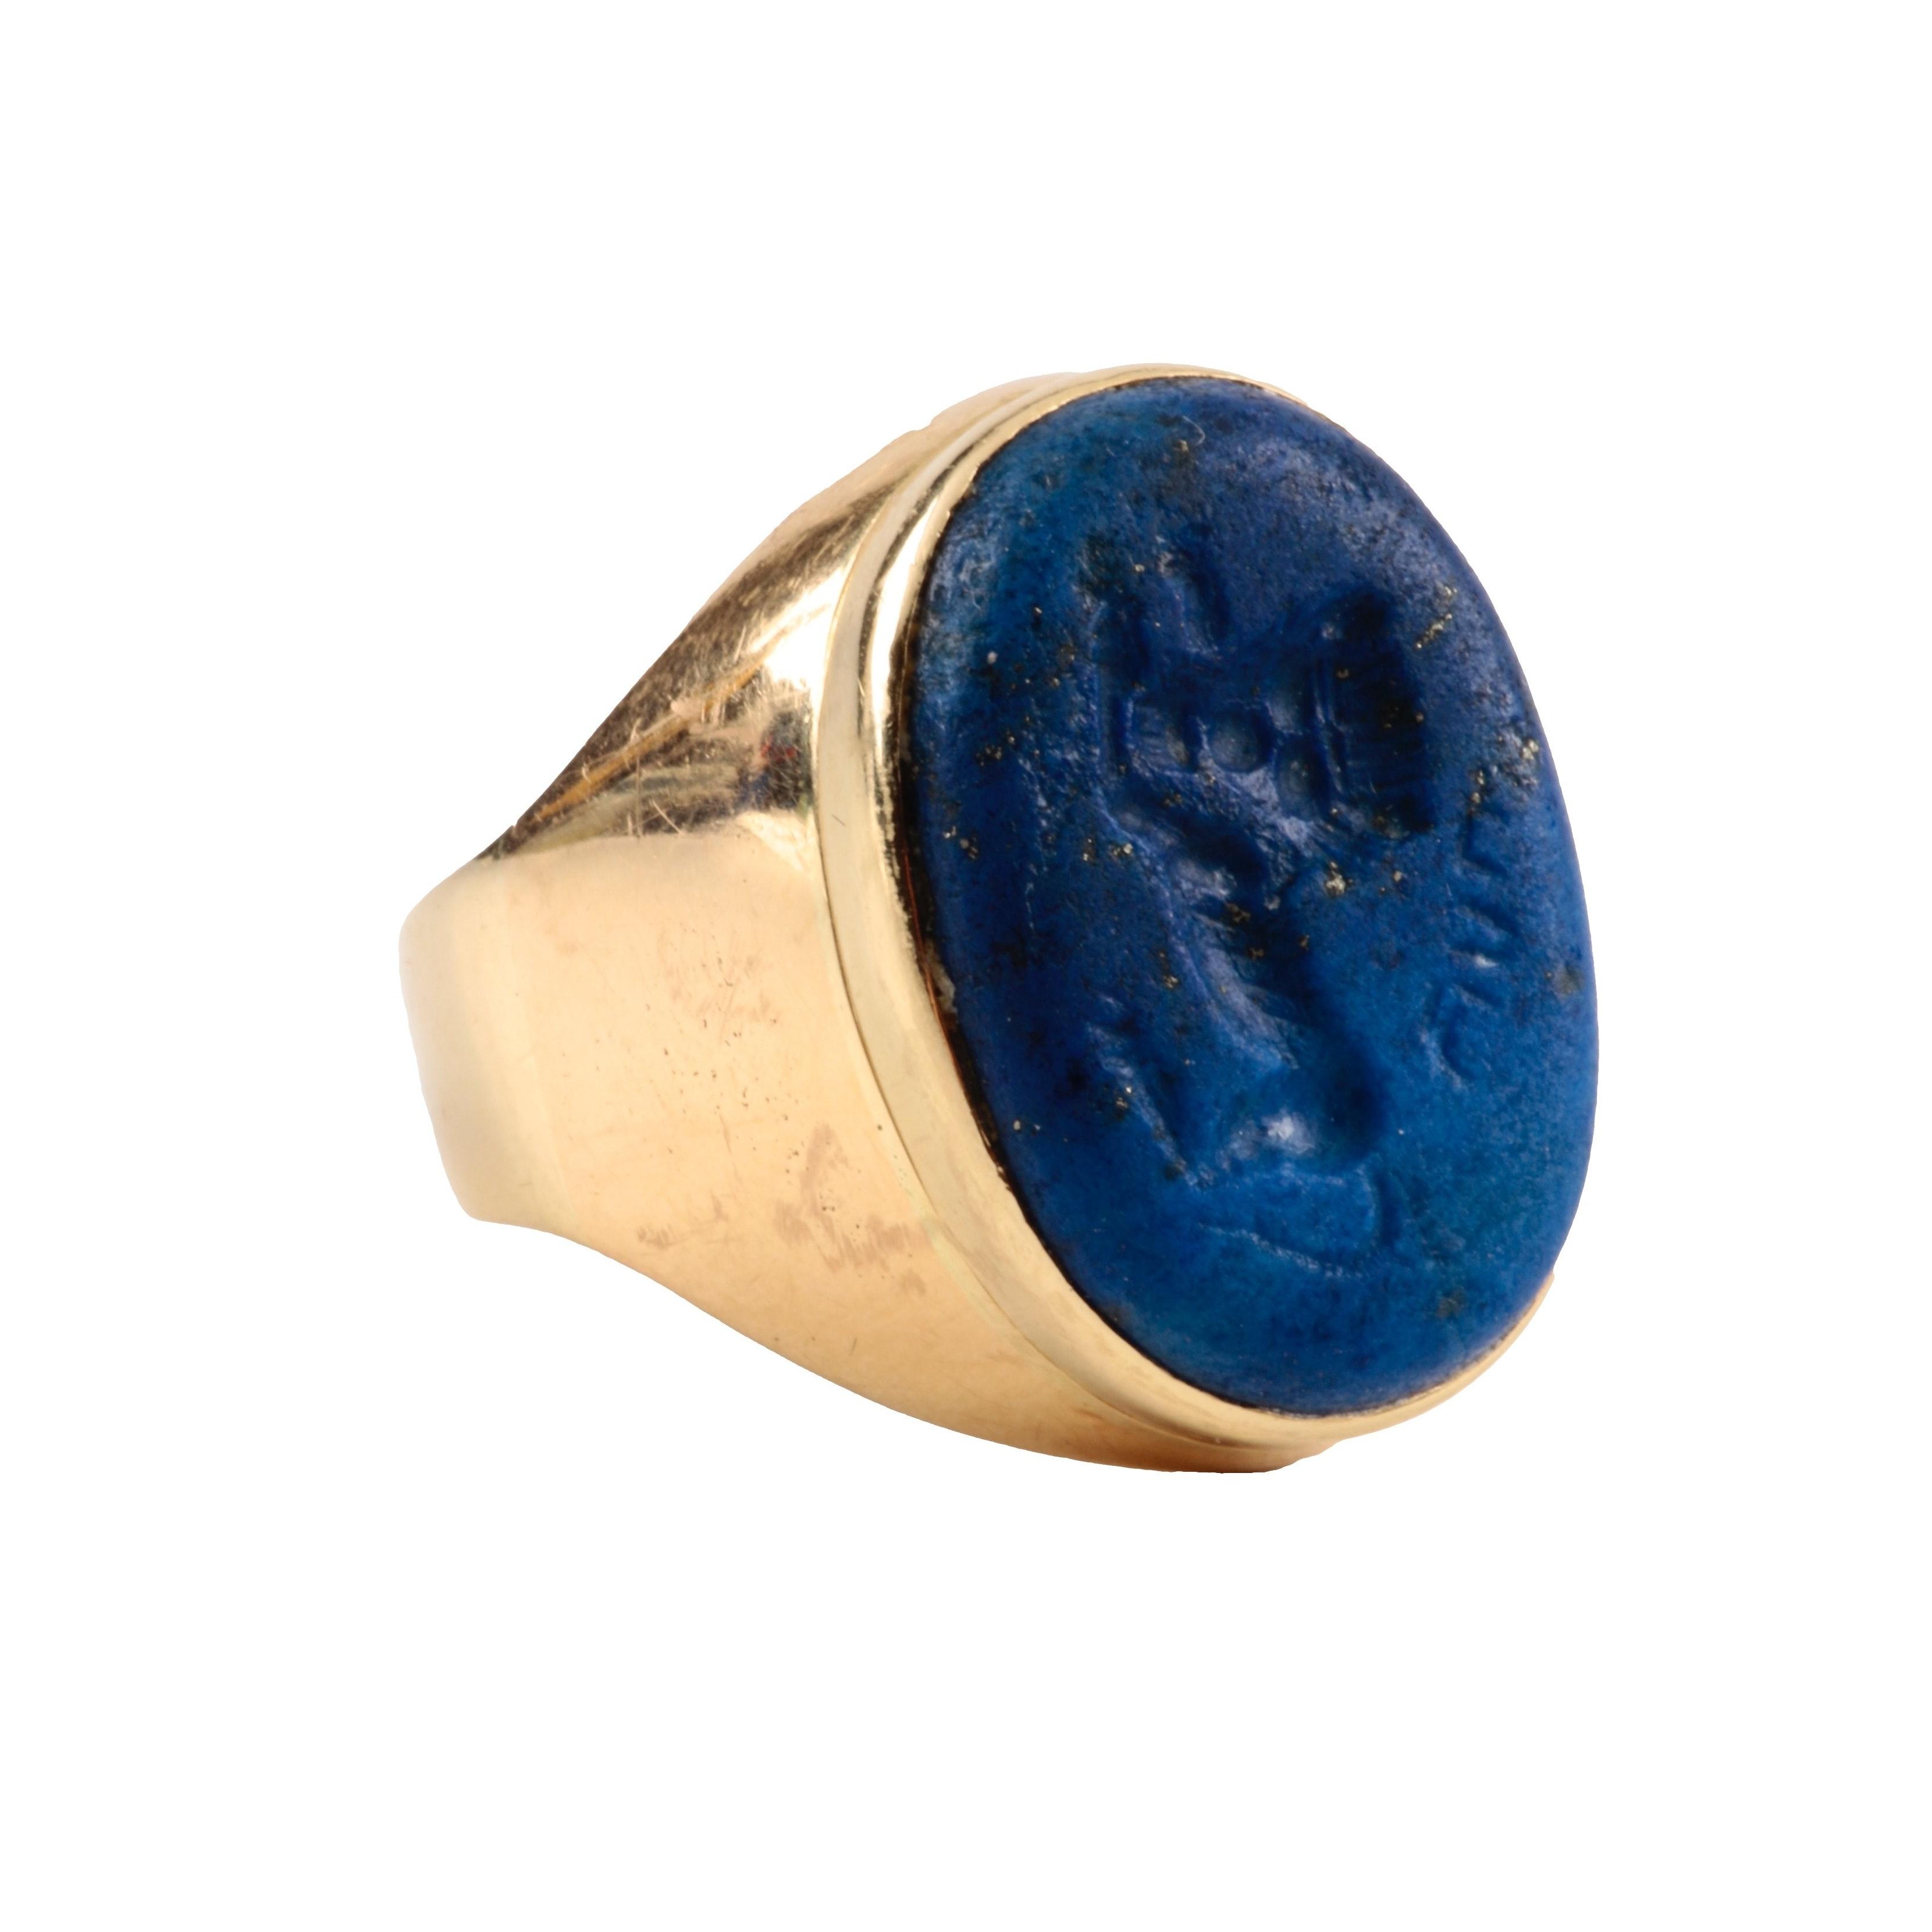 Dr. Schuller's 14K Yellow Gold Lapis Lazuli Intaglio Seal Ring